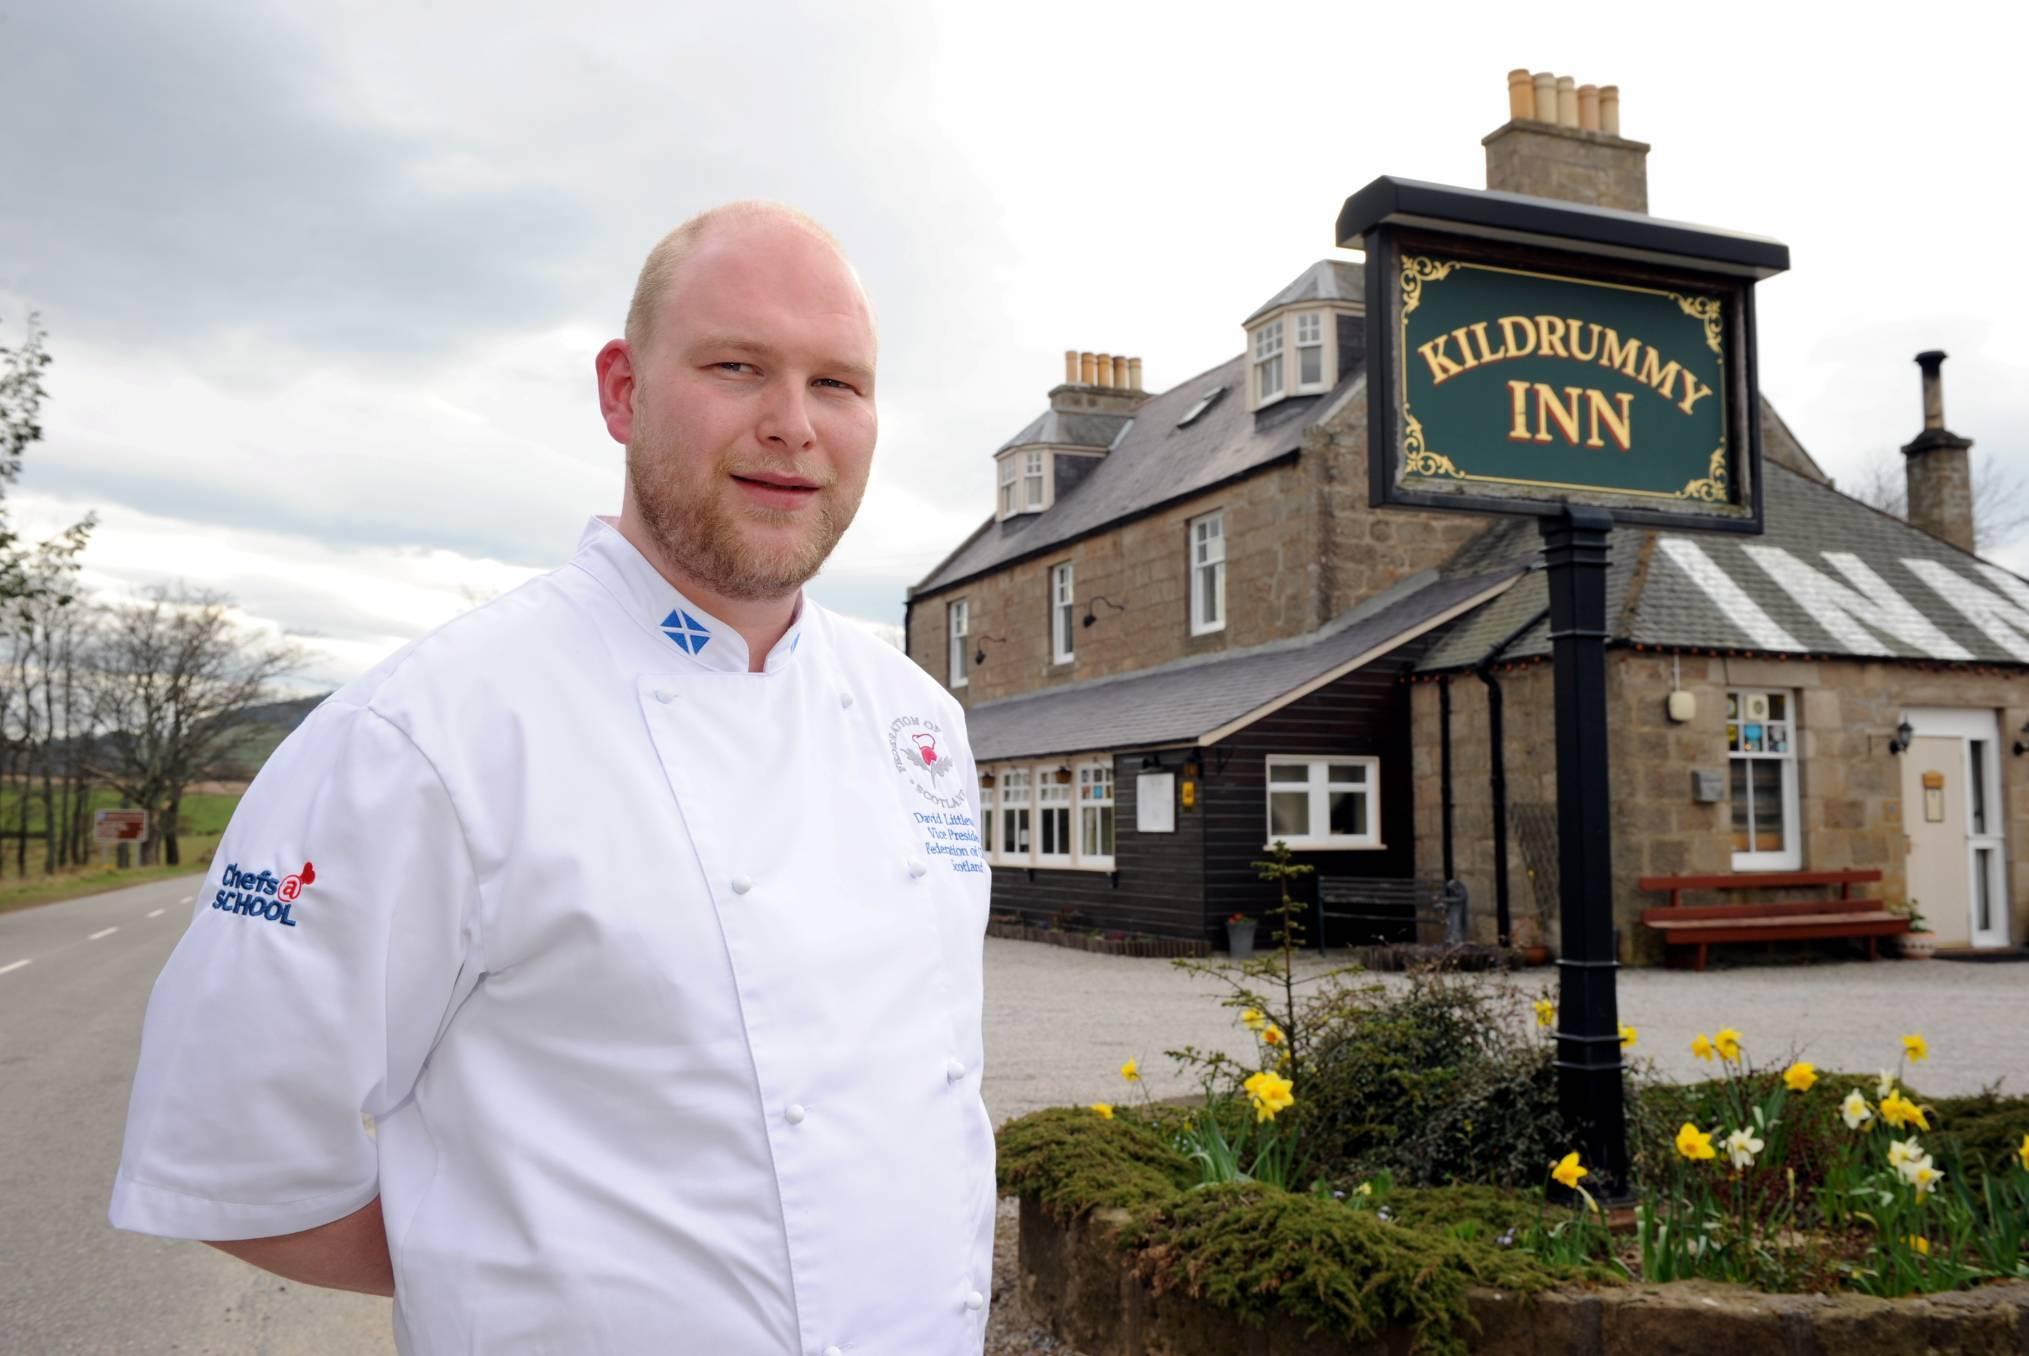 David Littlewood at the Kildrummy Inn